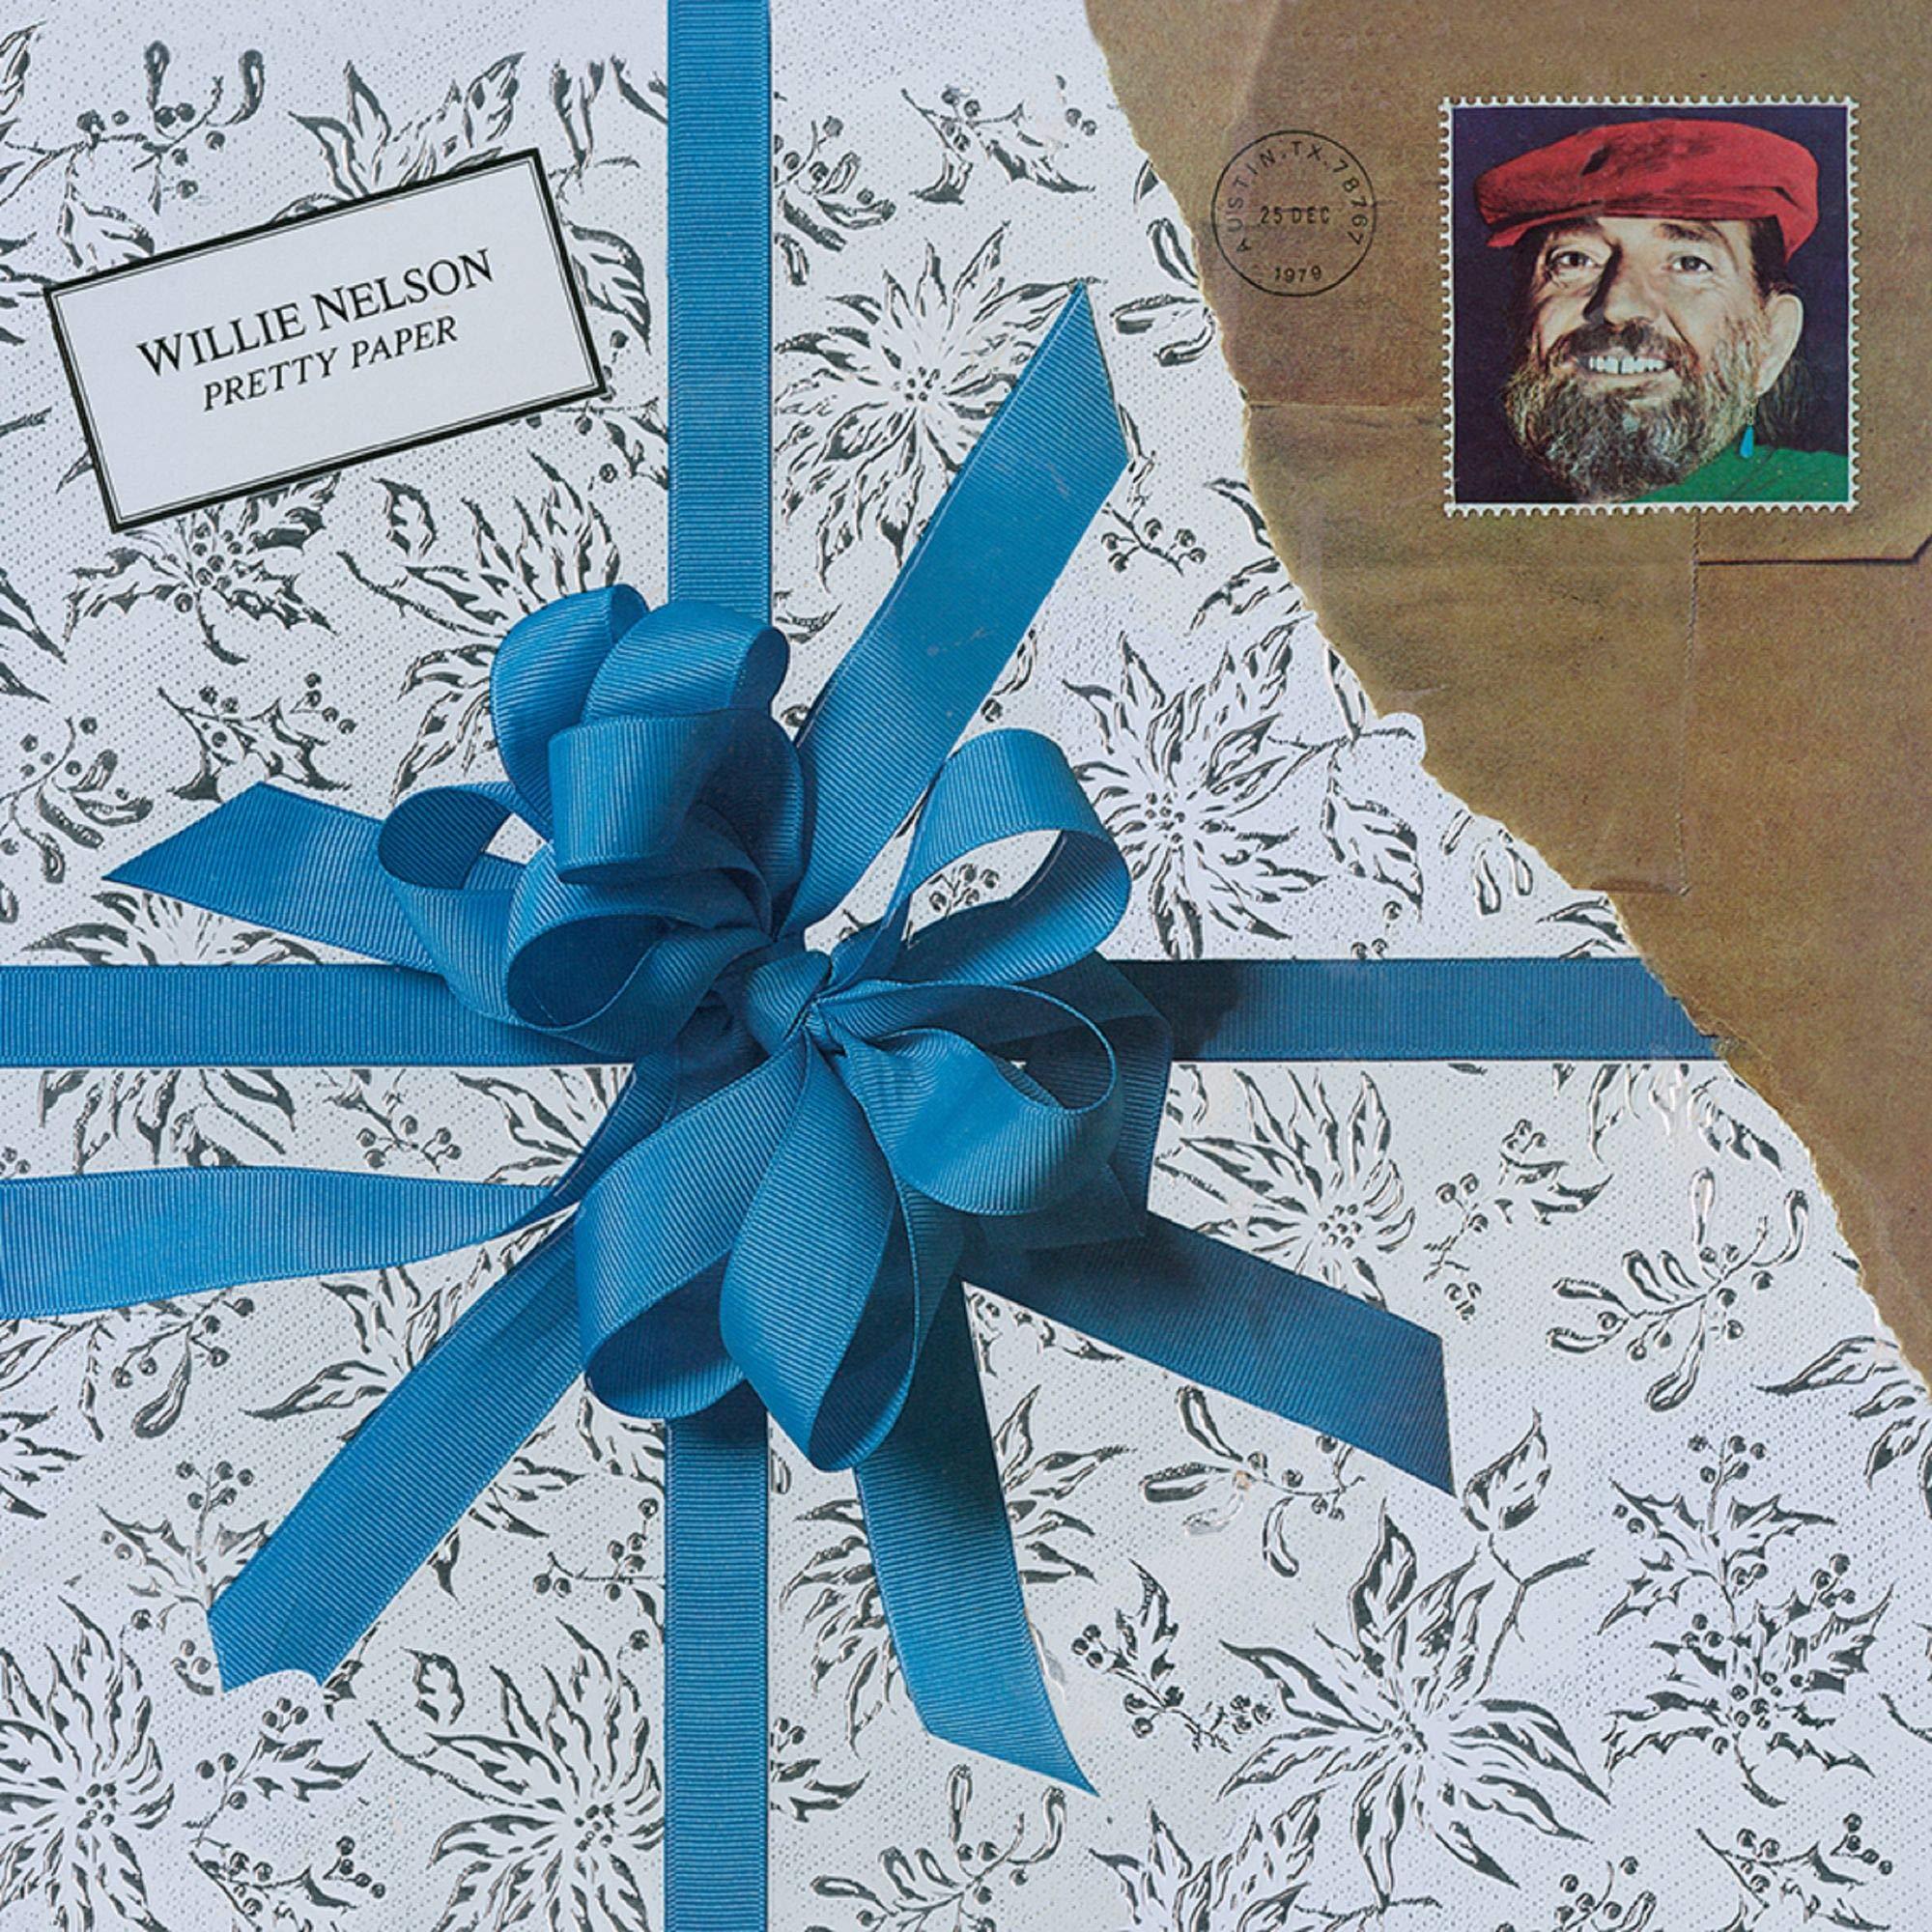 Vinilo : Willie Nelson - Pretty Paper (180 Gram Vinyl, Gatefold LP Jacket, Limited Edition, Audiophile)